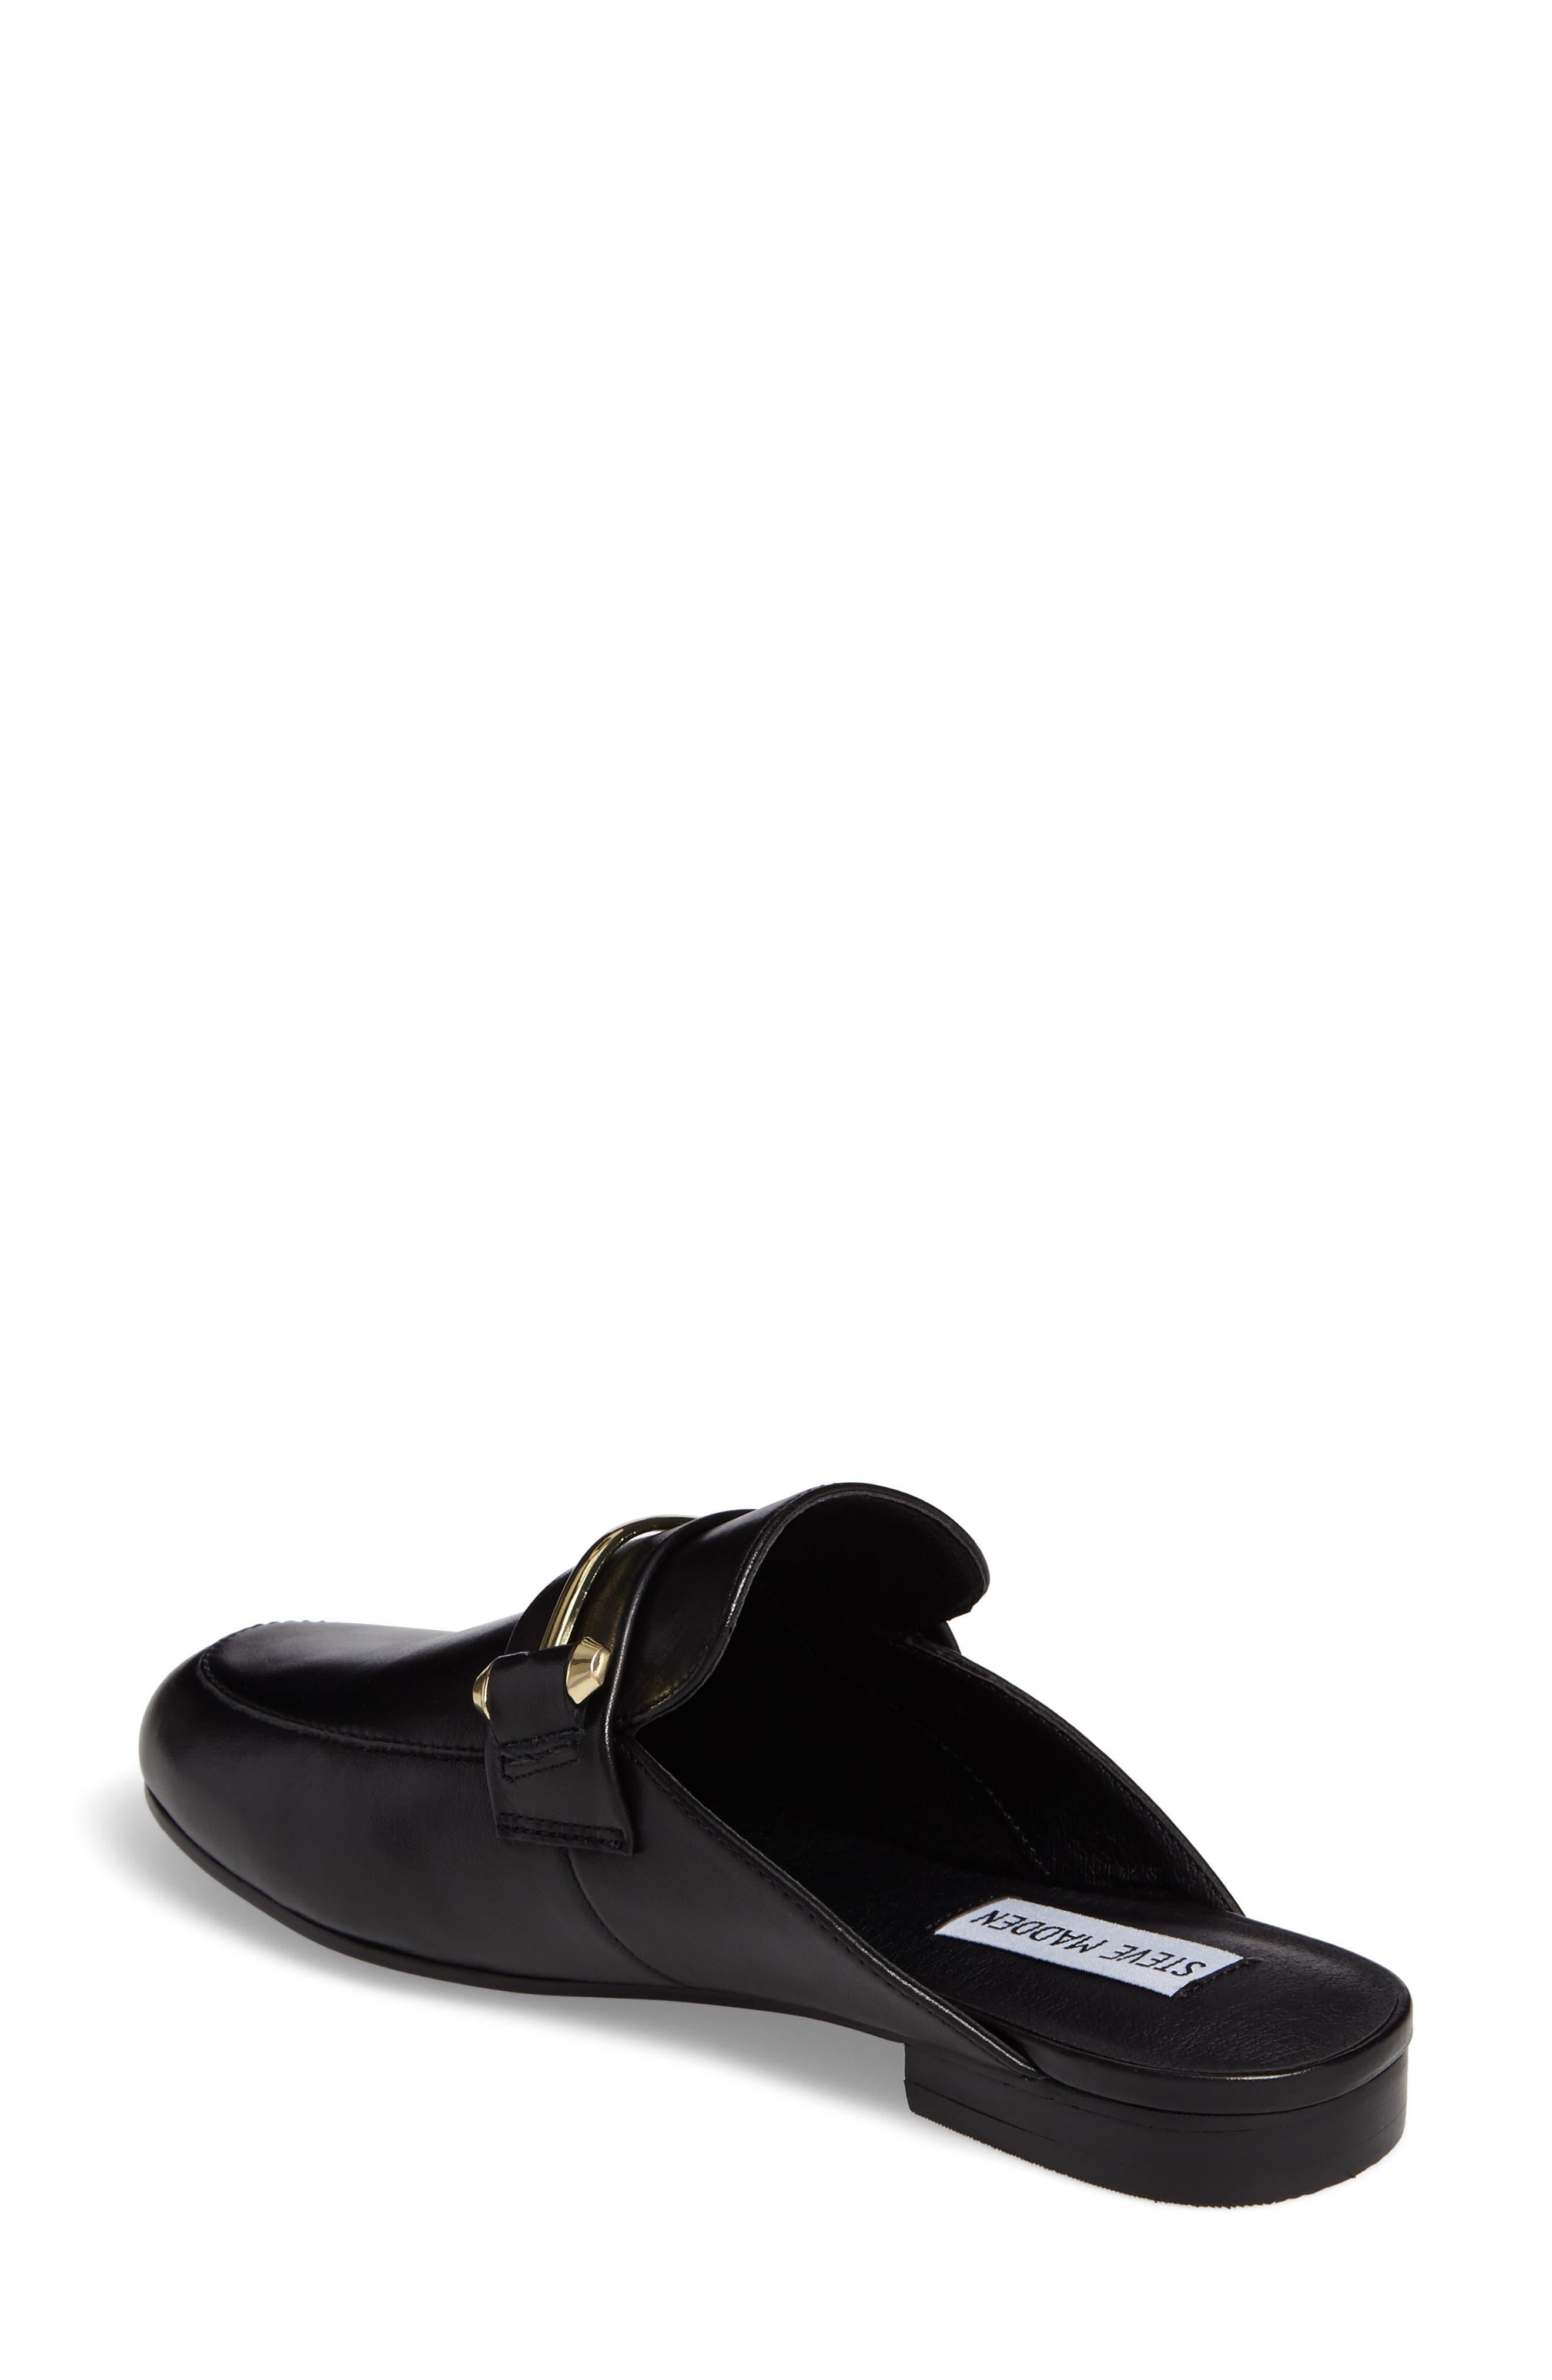 Kera Flat Loafer Mule,                             Alternate thumbnail 2, color,                             Black Leather